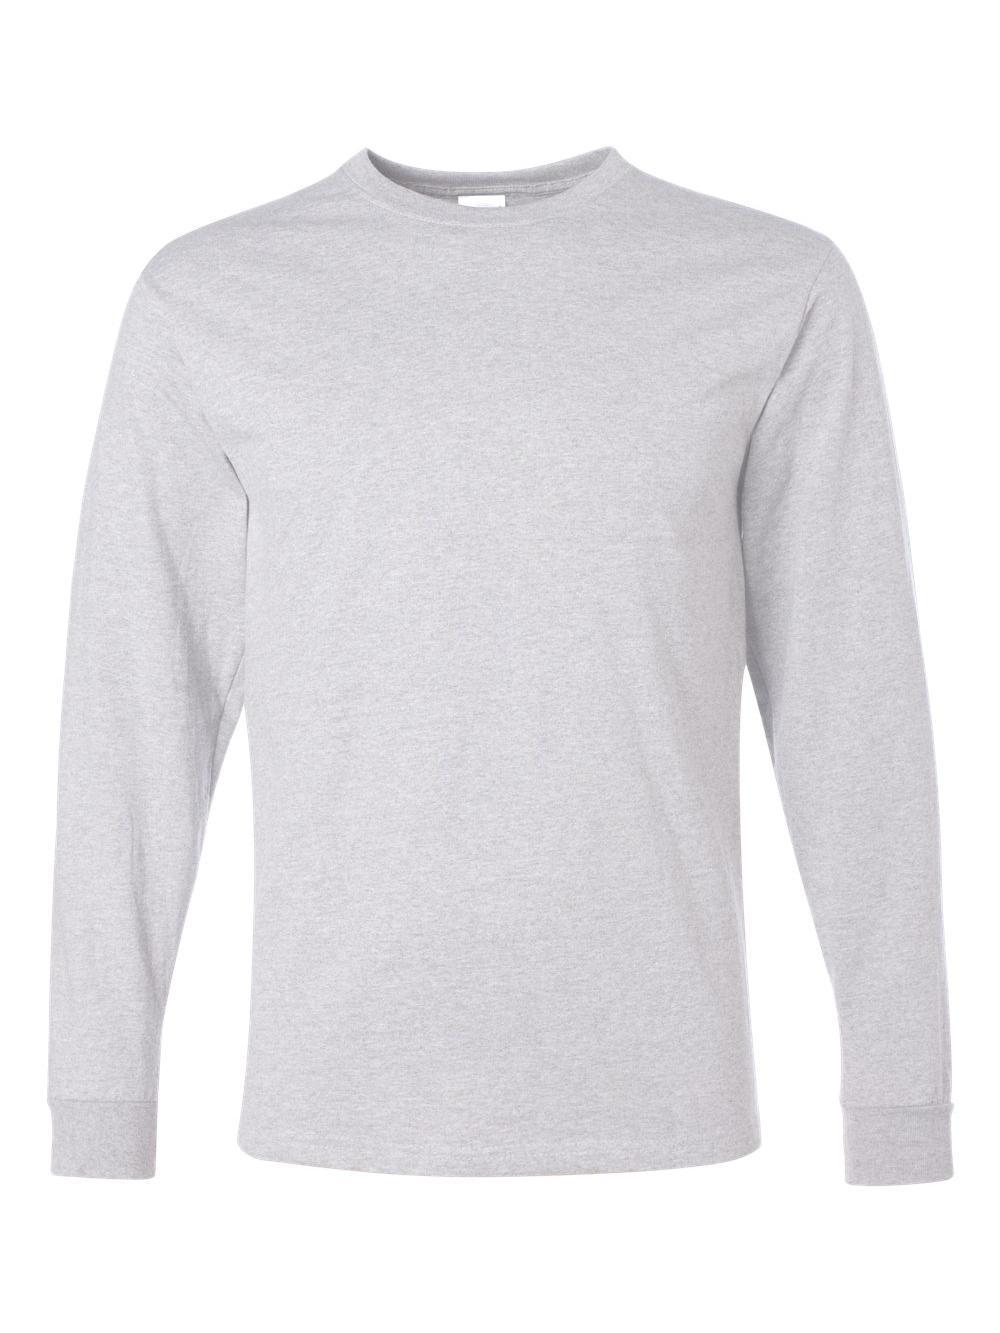 Jerzees-Dri-Power-Long-Sleeve-50-50-T-Shirt-29LSR thumbnail 3